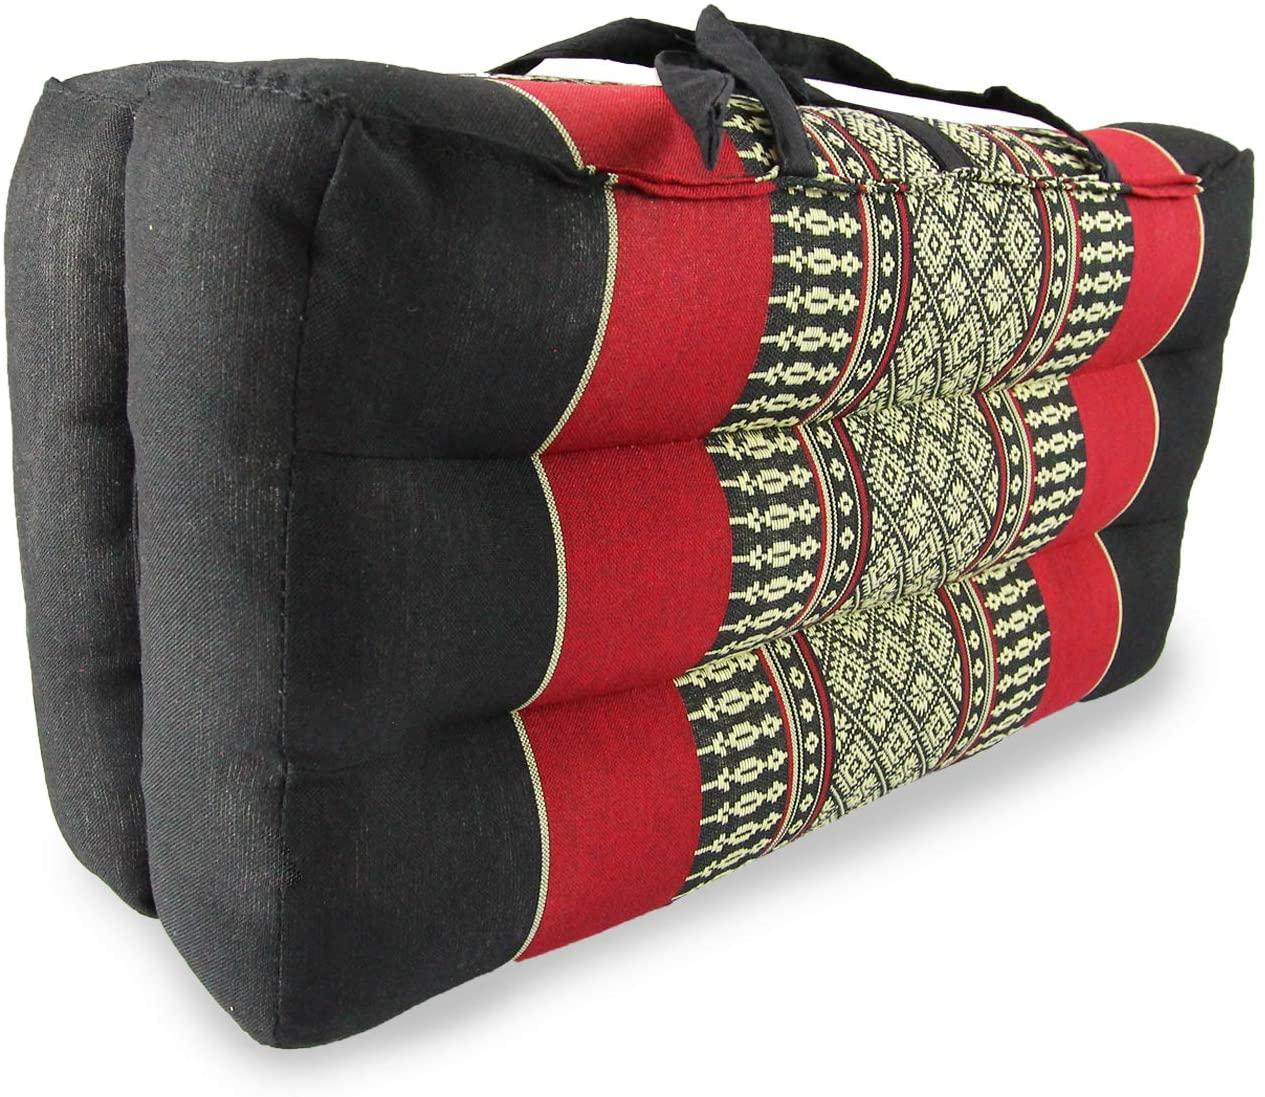 Avran Kapok Folding Yoga and Floor Cushion, 15 Inch (Thai Red Black)